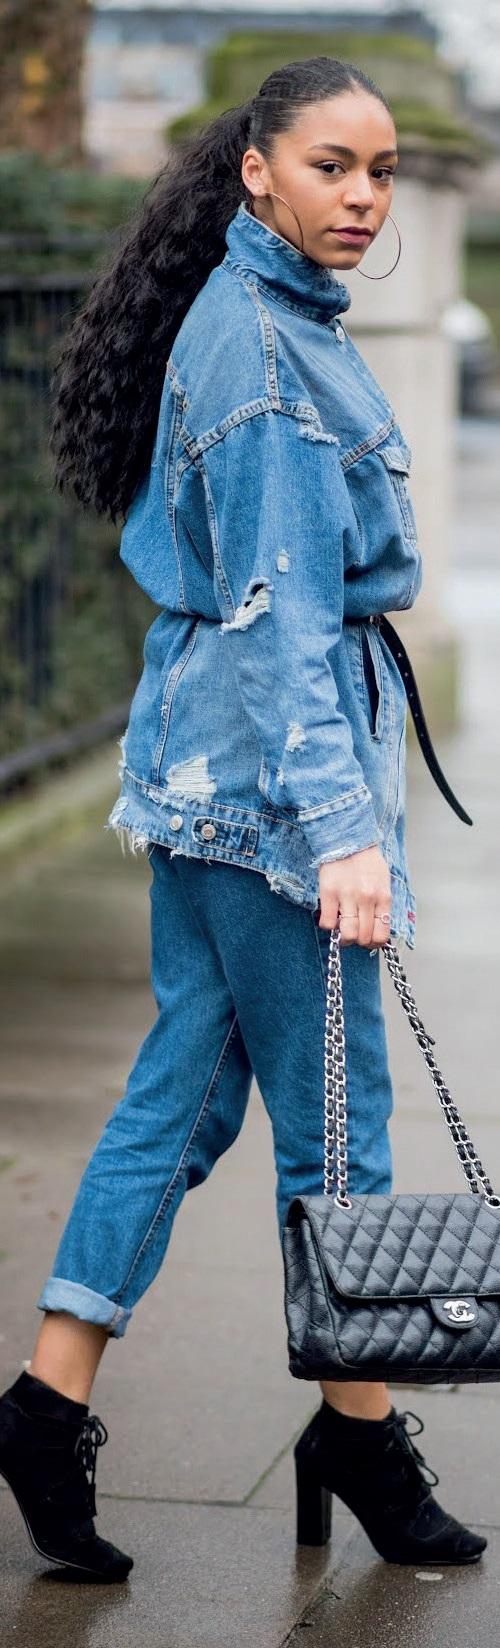 A three-piece denim outfit